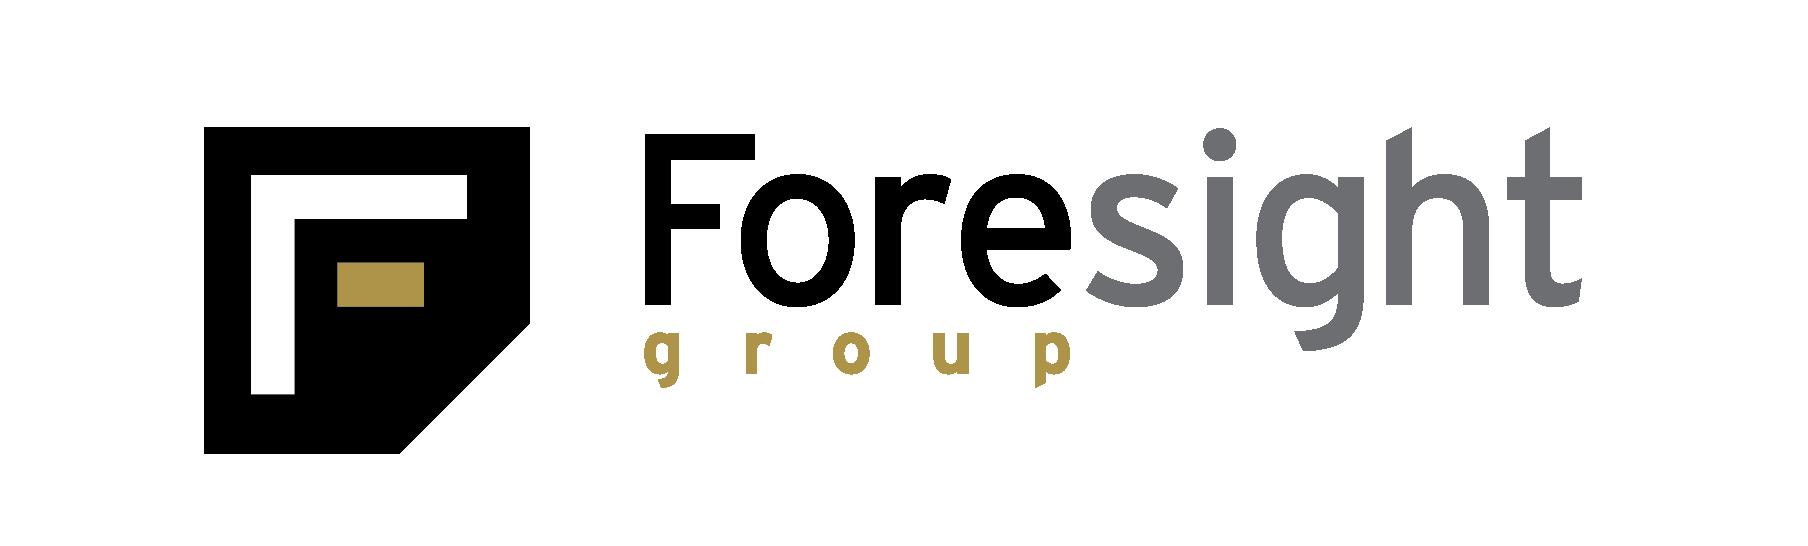 FS_logos__group-logo_Dec2016.png